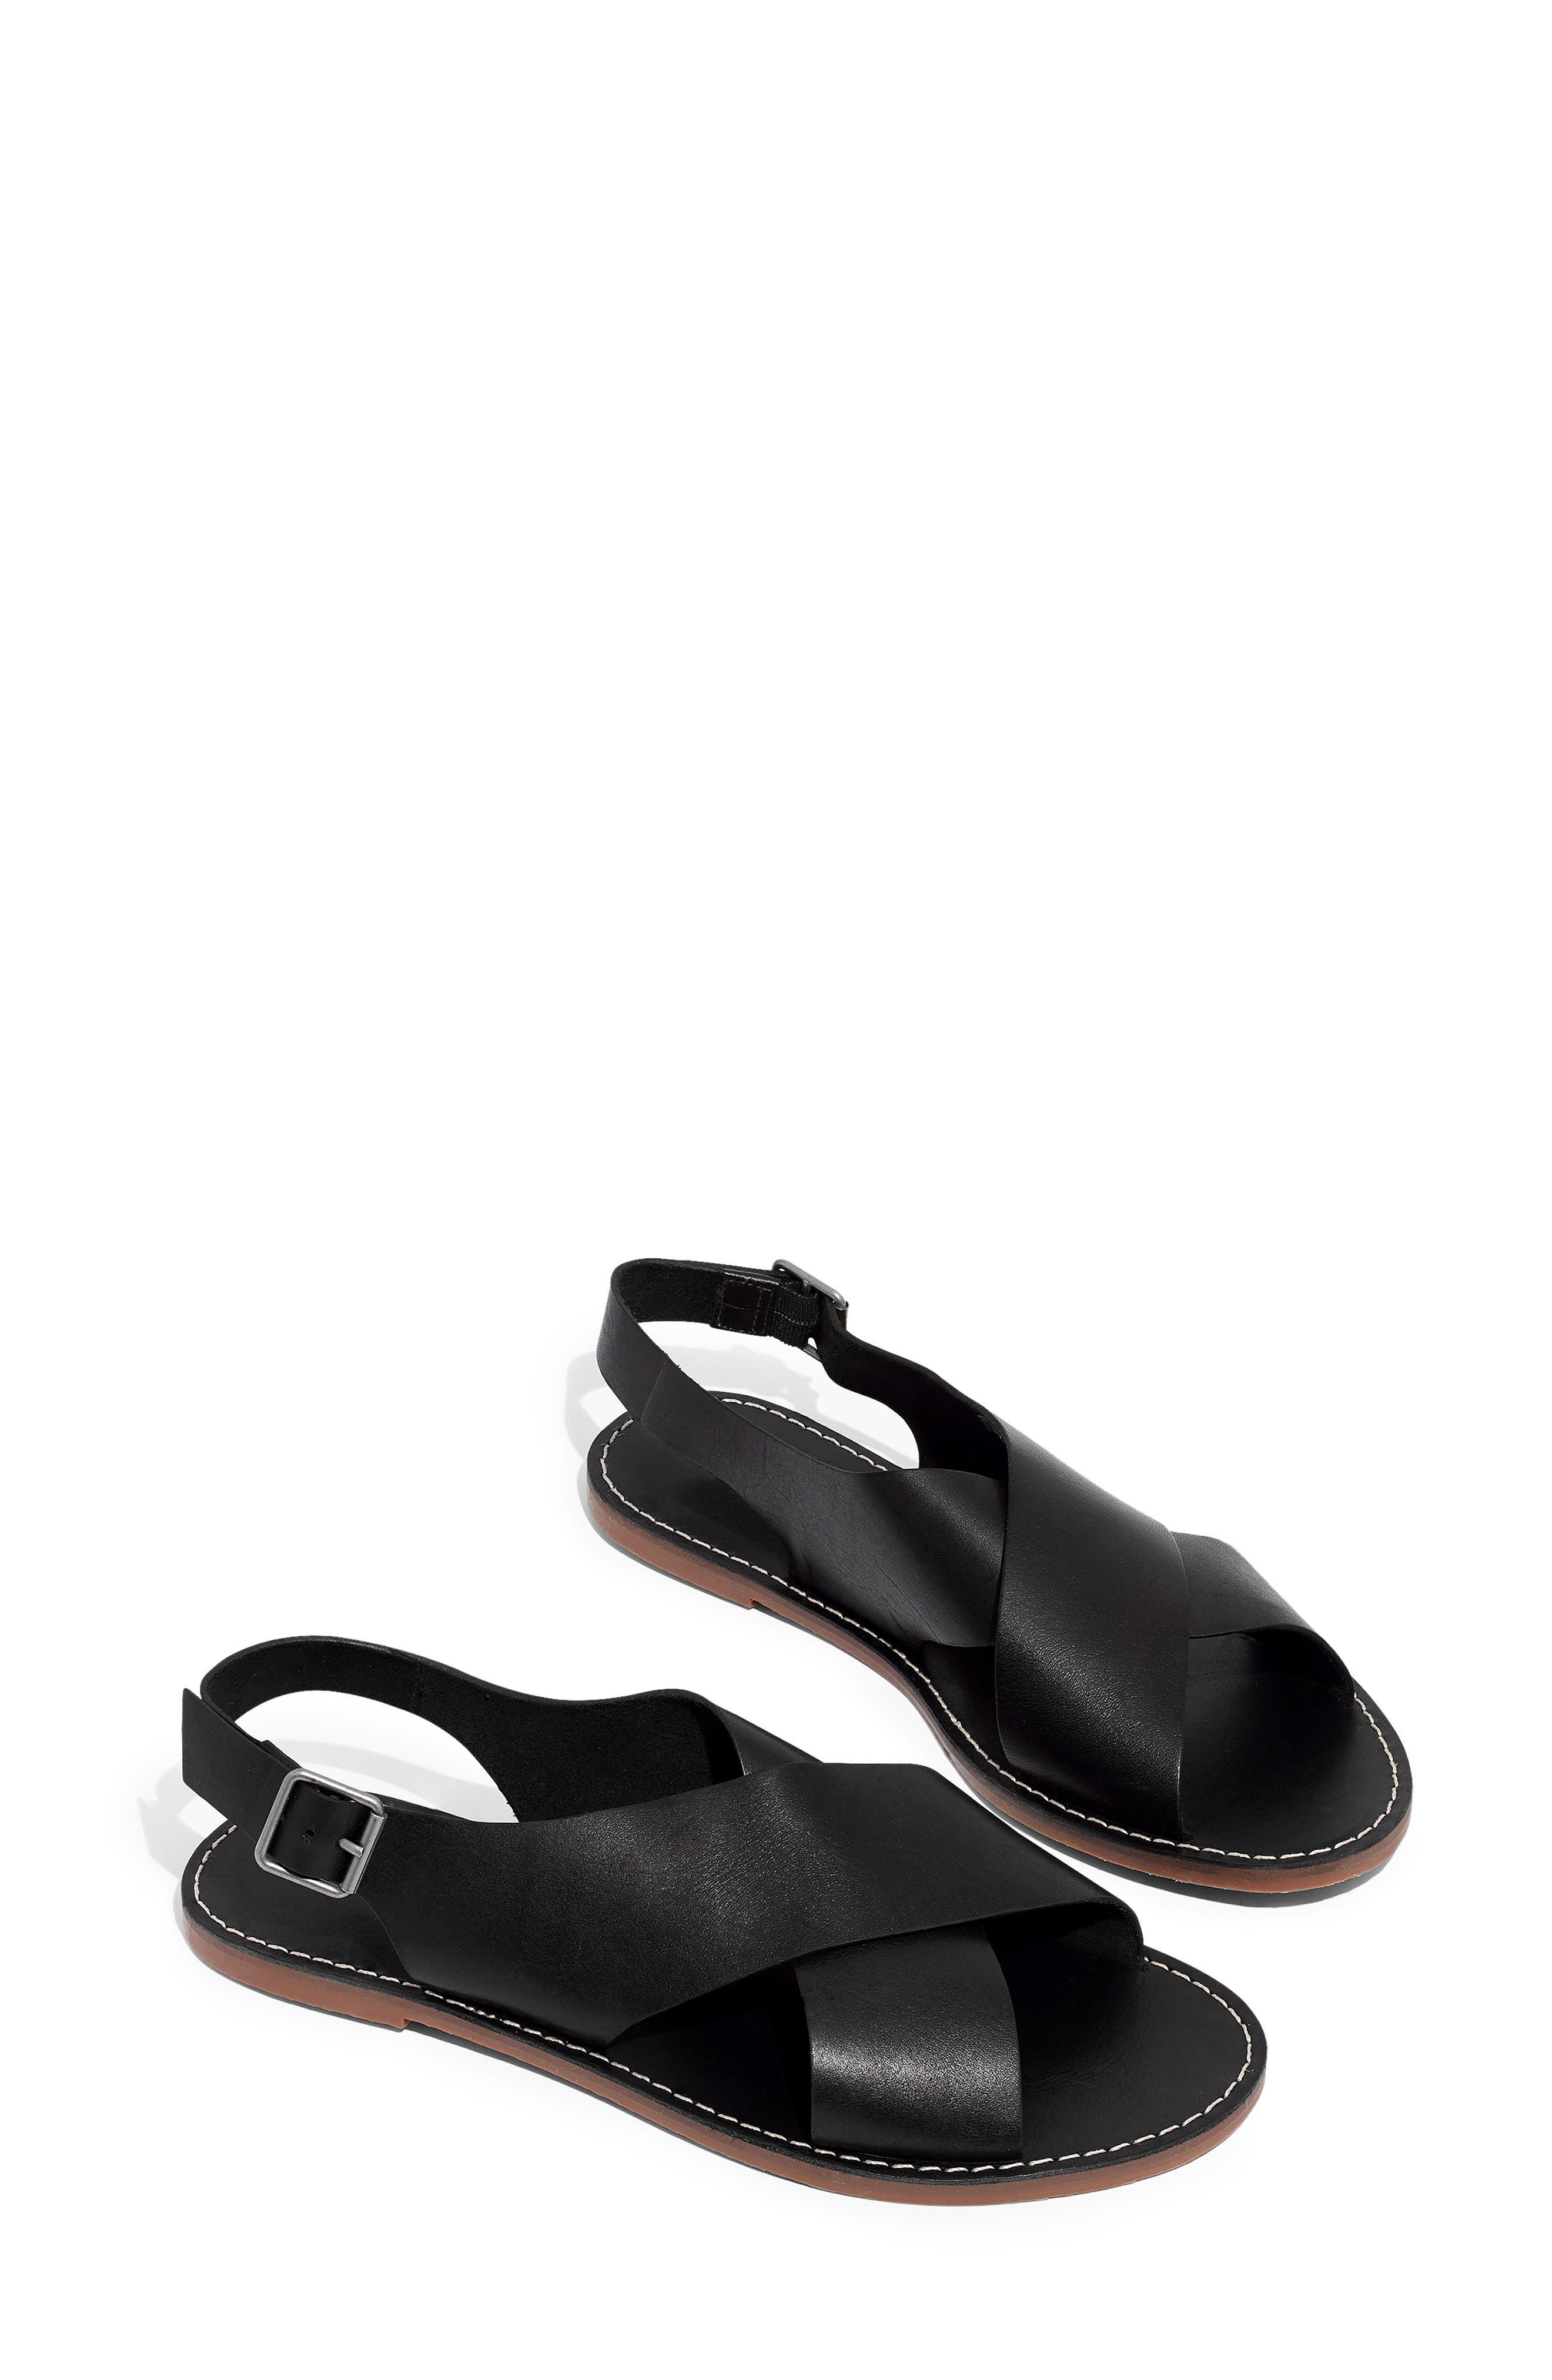 MADEWELL, Boardwalk Flat Sandal, Main thumbnail 1, color, TRUE BLACK